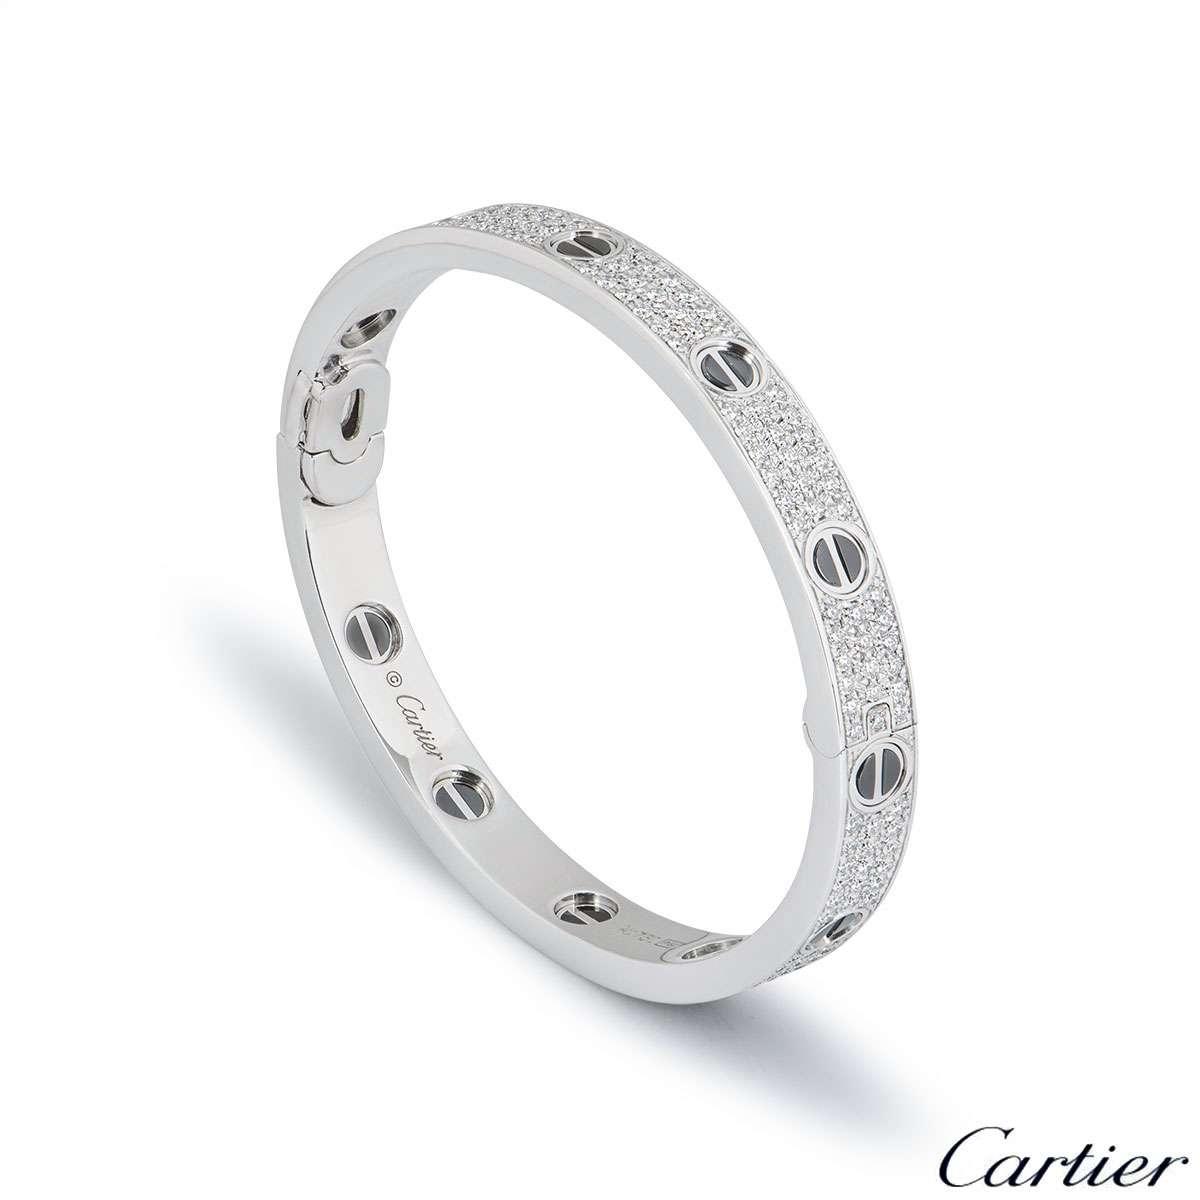 Cartier White Gold Pave Diamond & Ceramic Love Bracelet Size 16 N6032416